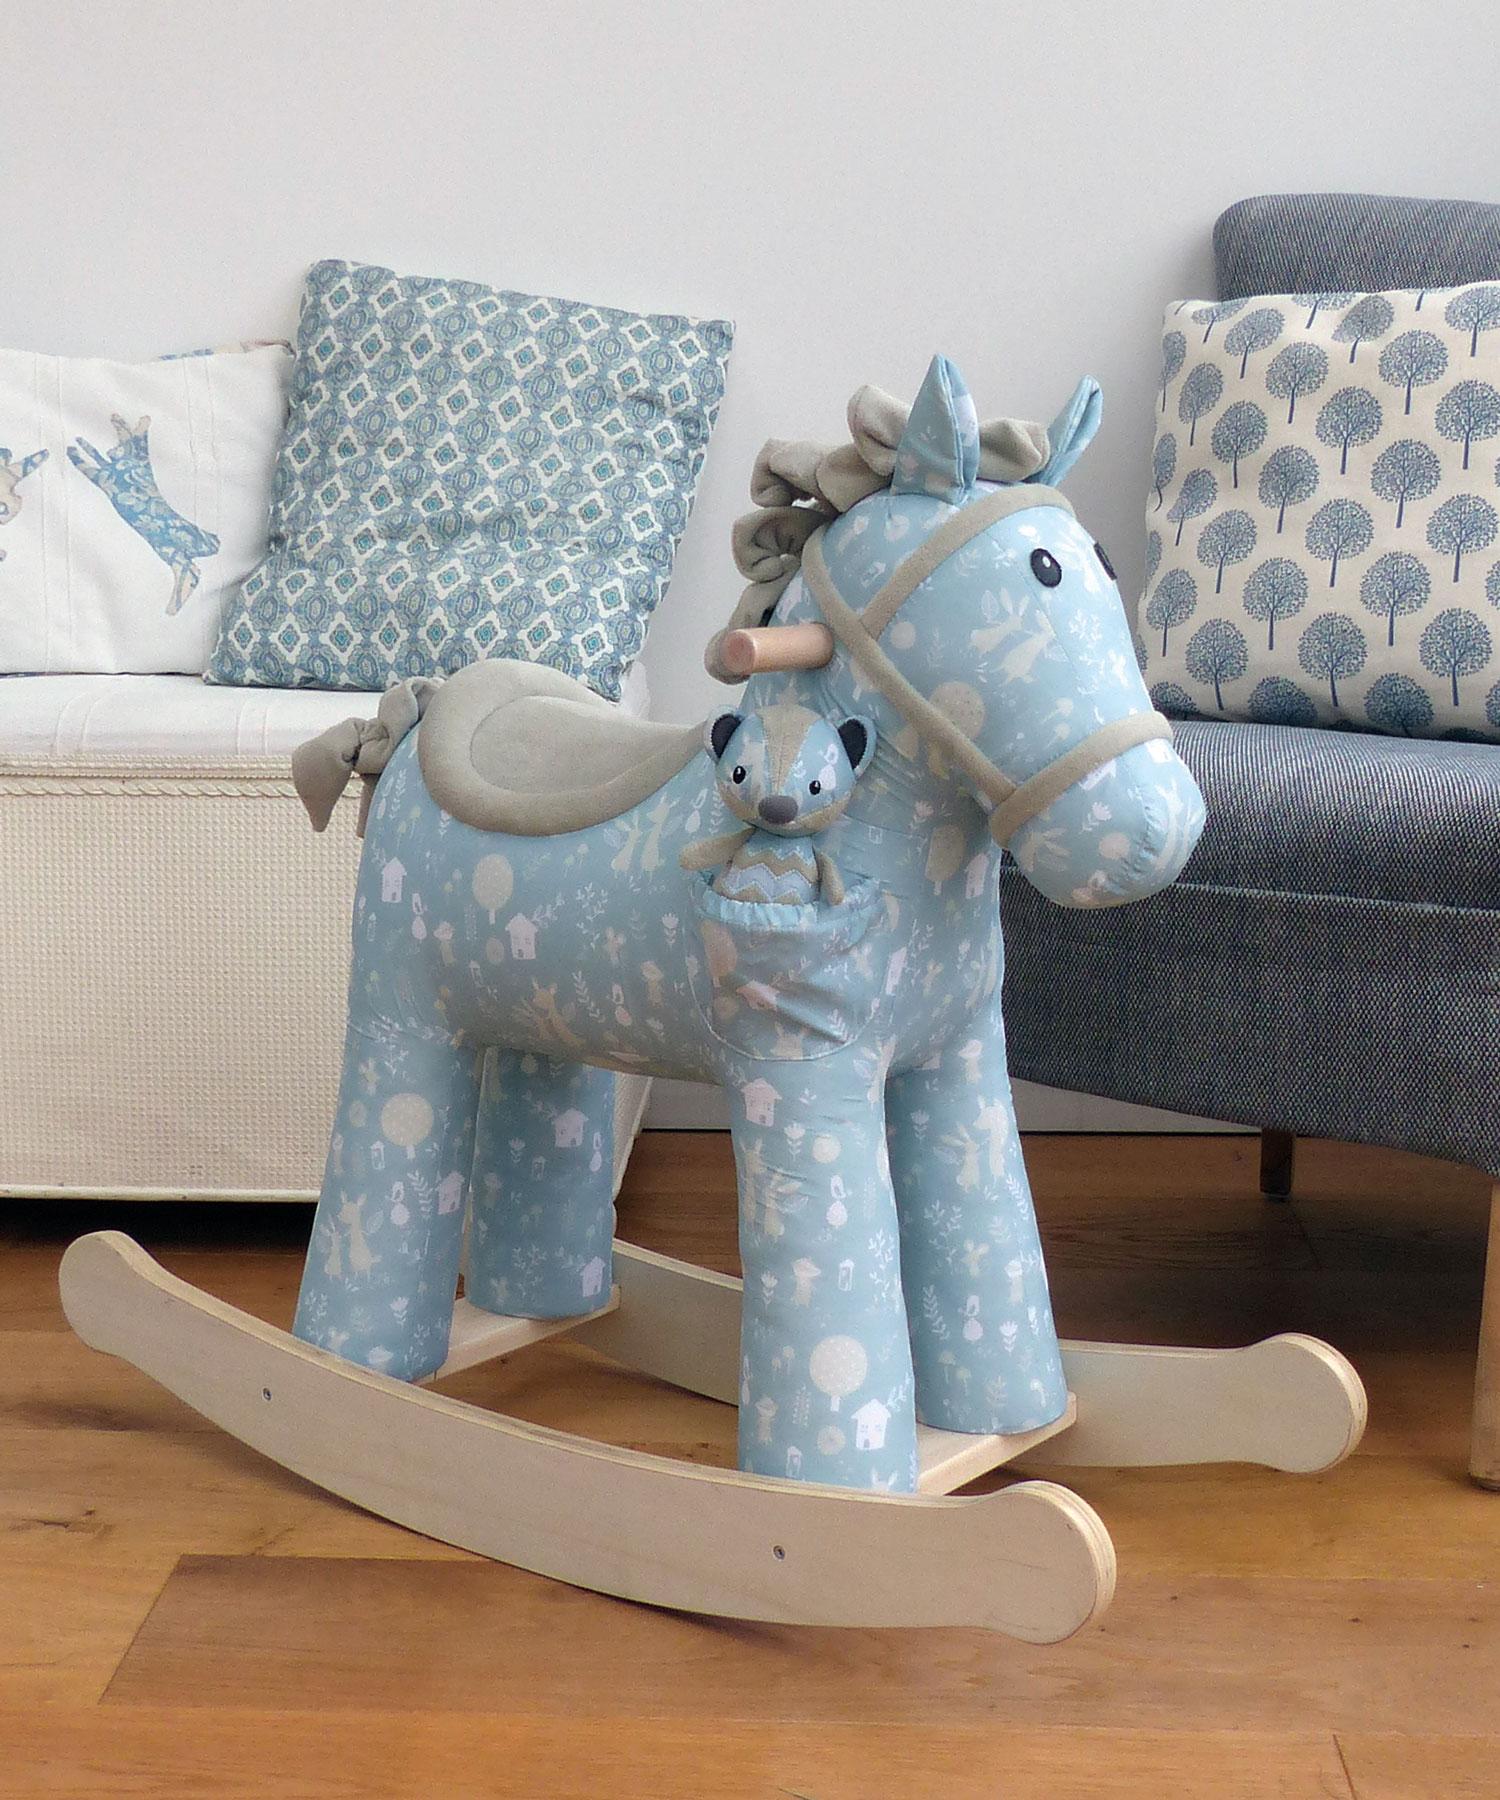 Finn & Munchkin Personalised Rocking Horse